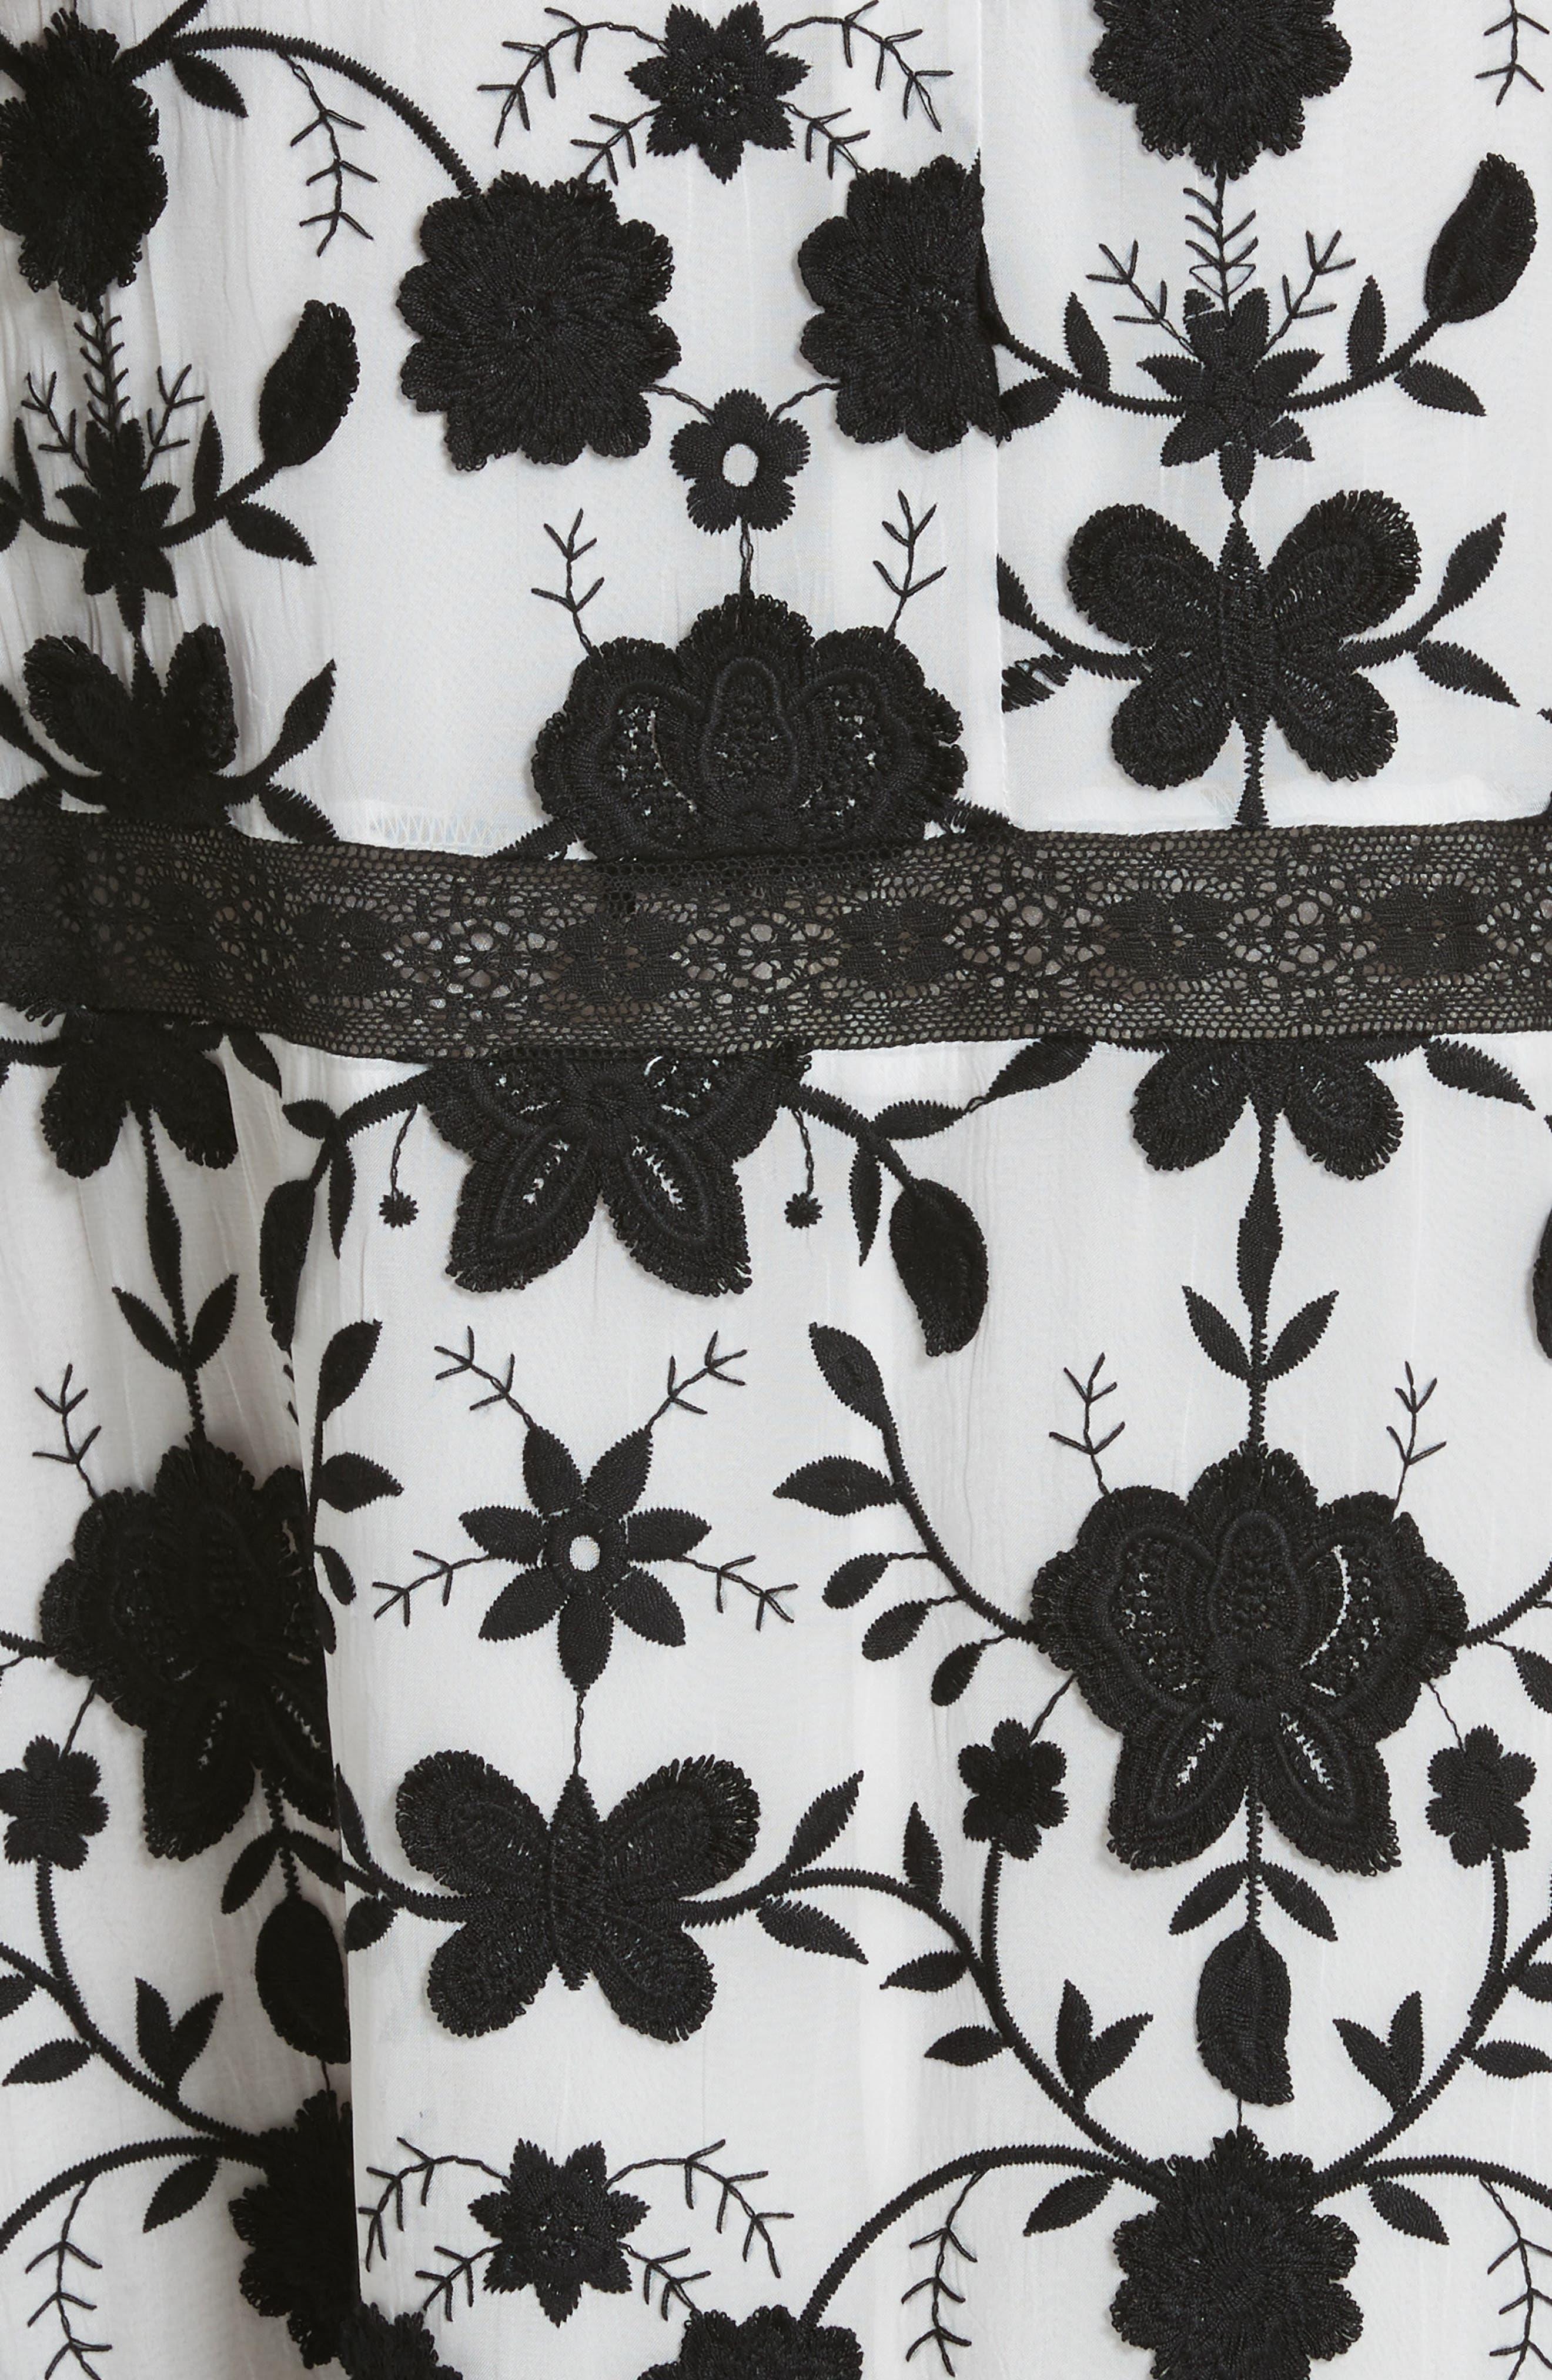 Fusca Floral Print Maxi Dress,                             Alternate thumbnail 5, color,                             Porcelain/ Caviar